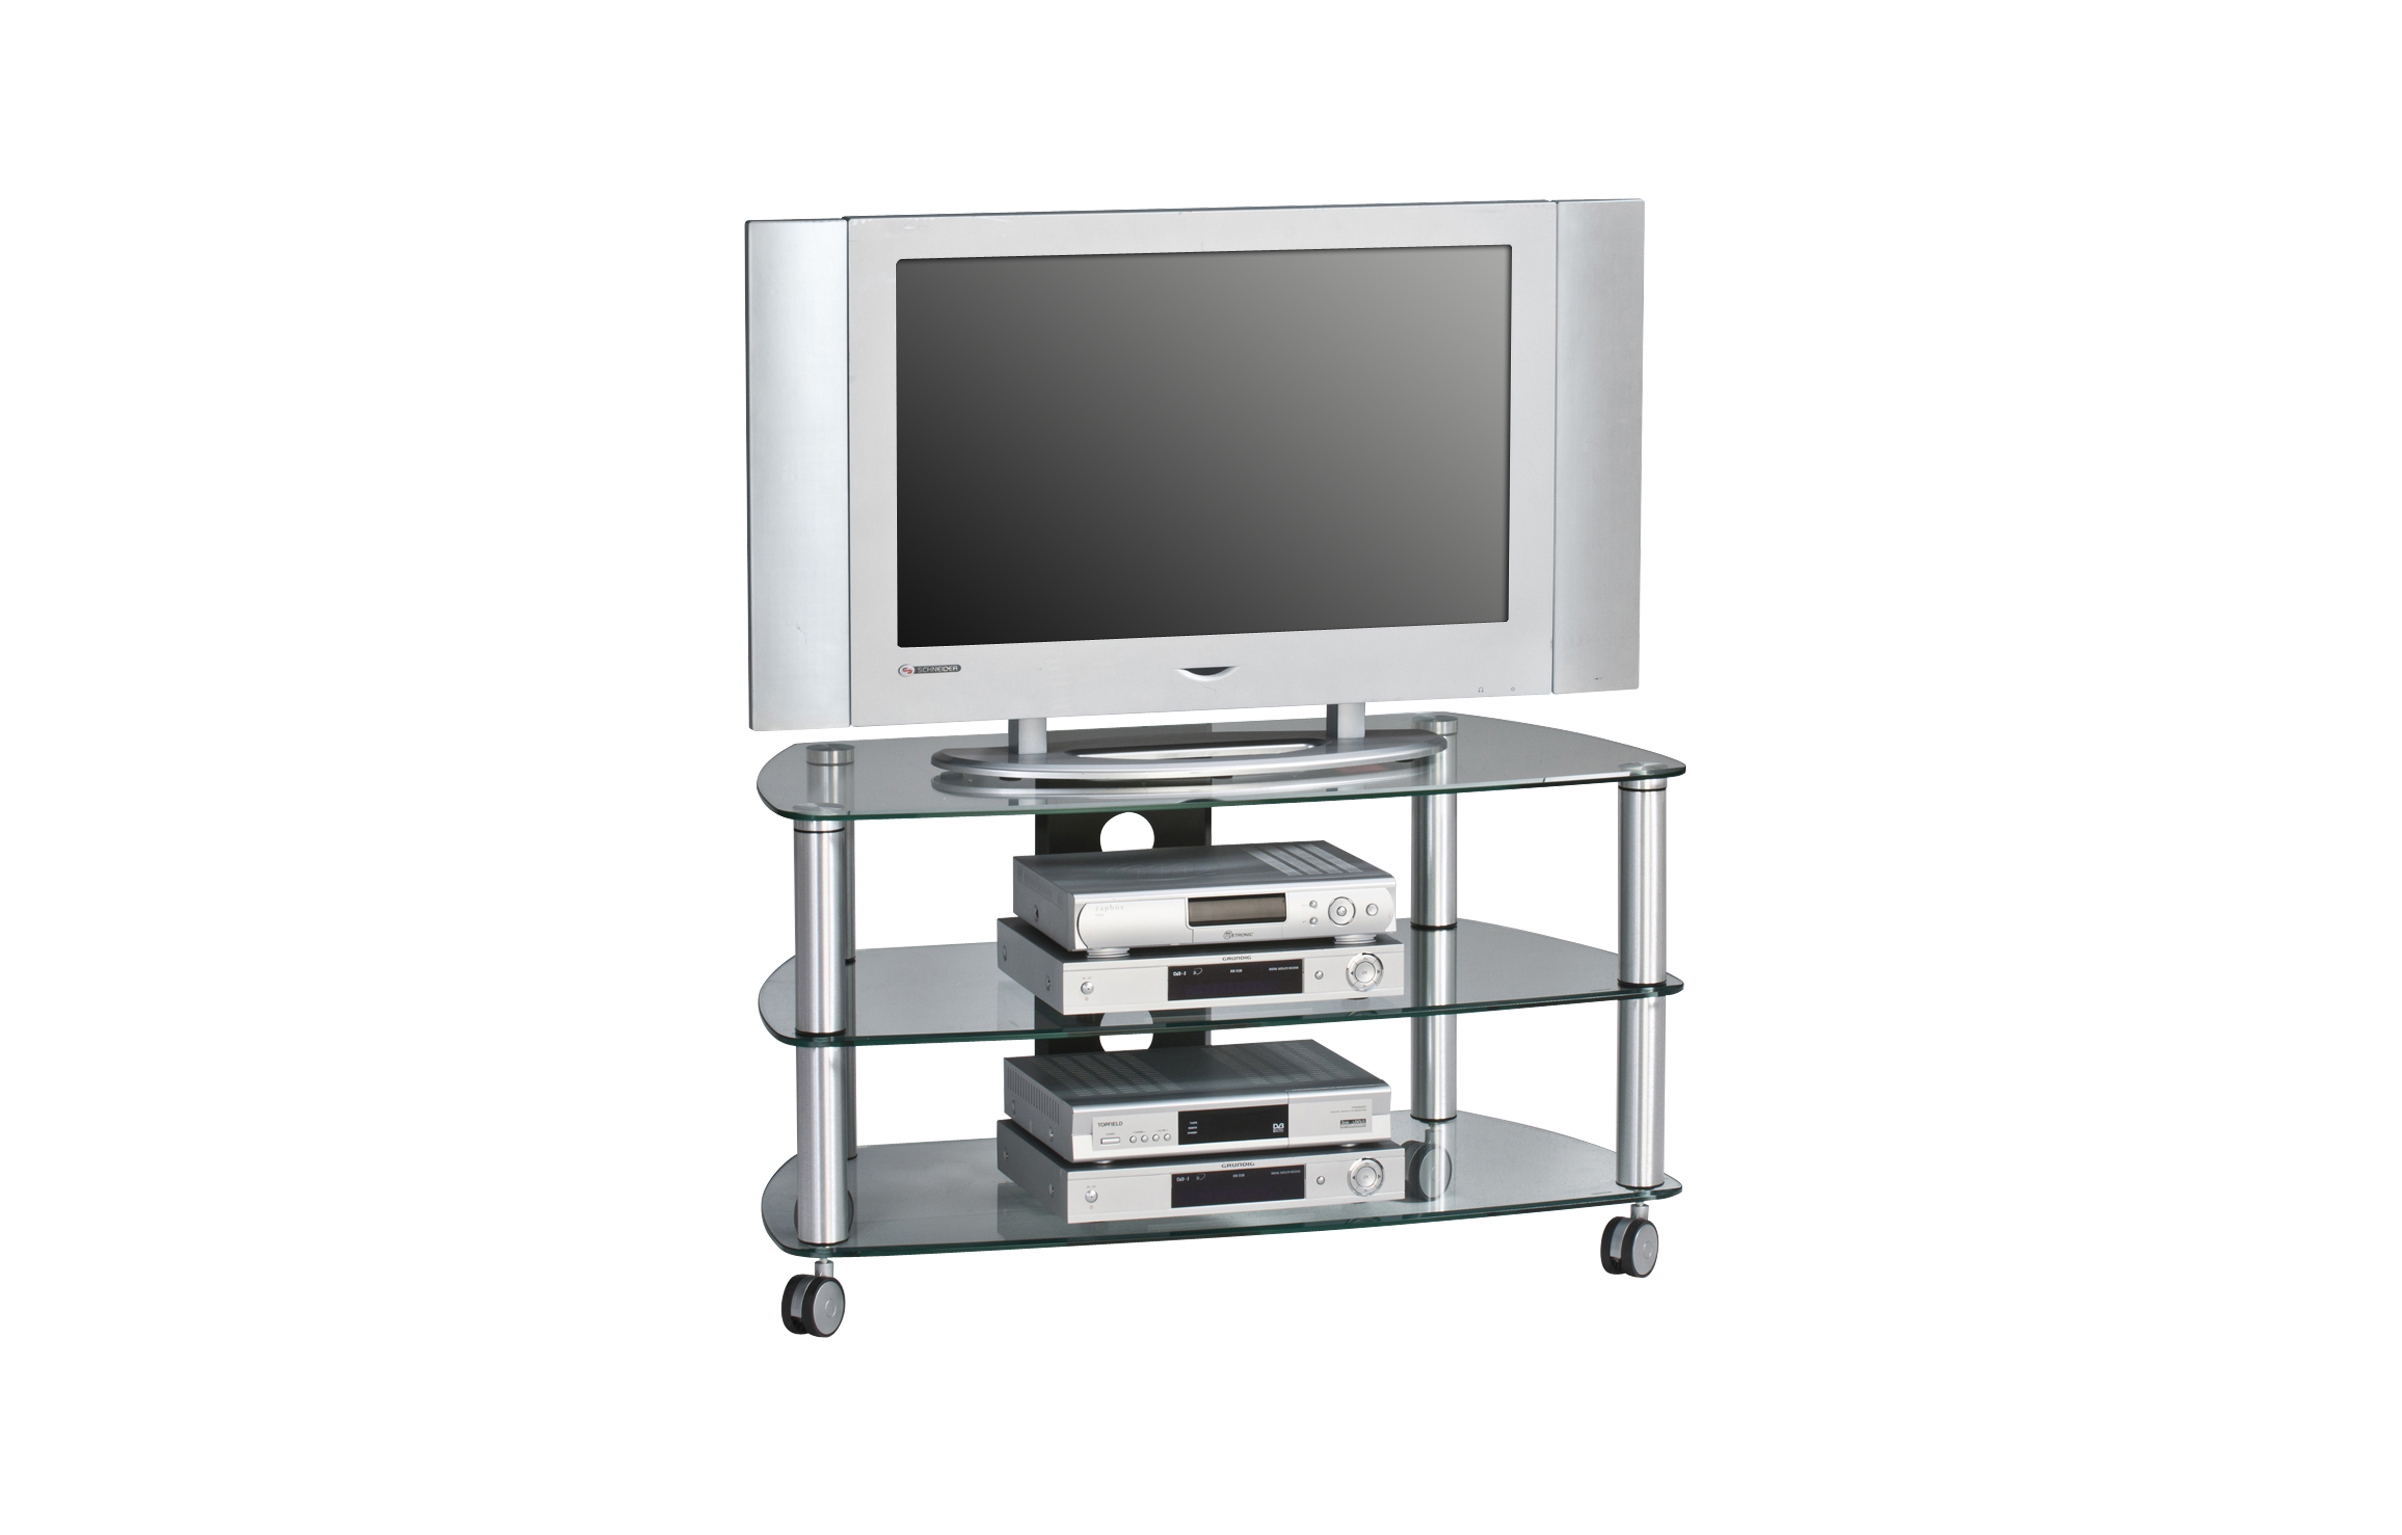 tv rack tv board glastisch ablage desgin tv wagen videowagen mj038 metall alu ebay. Black Bedroom Furniture Sets. Home Design Ideas